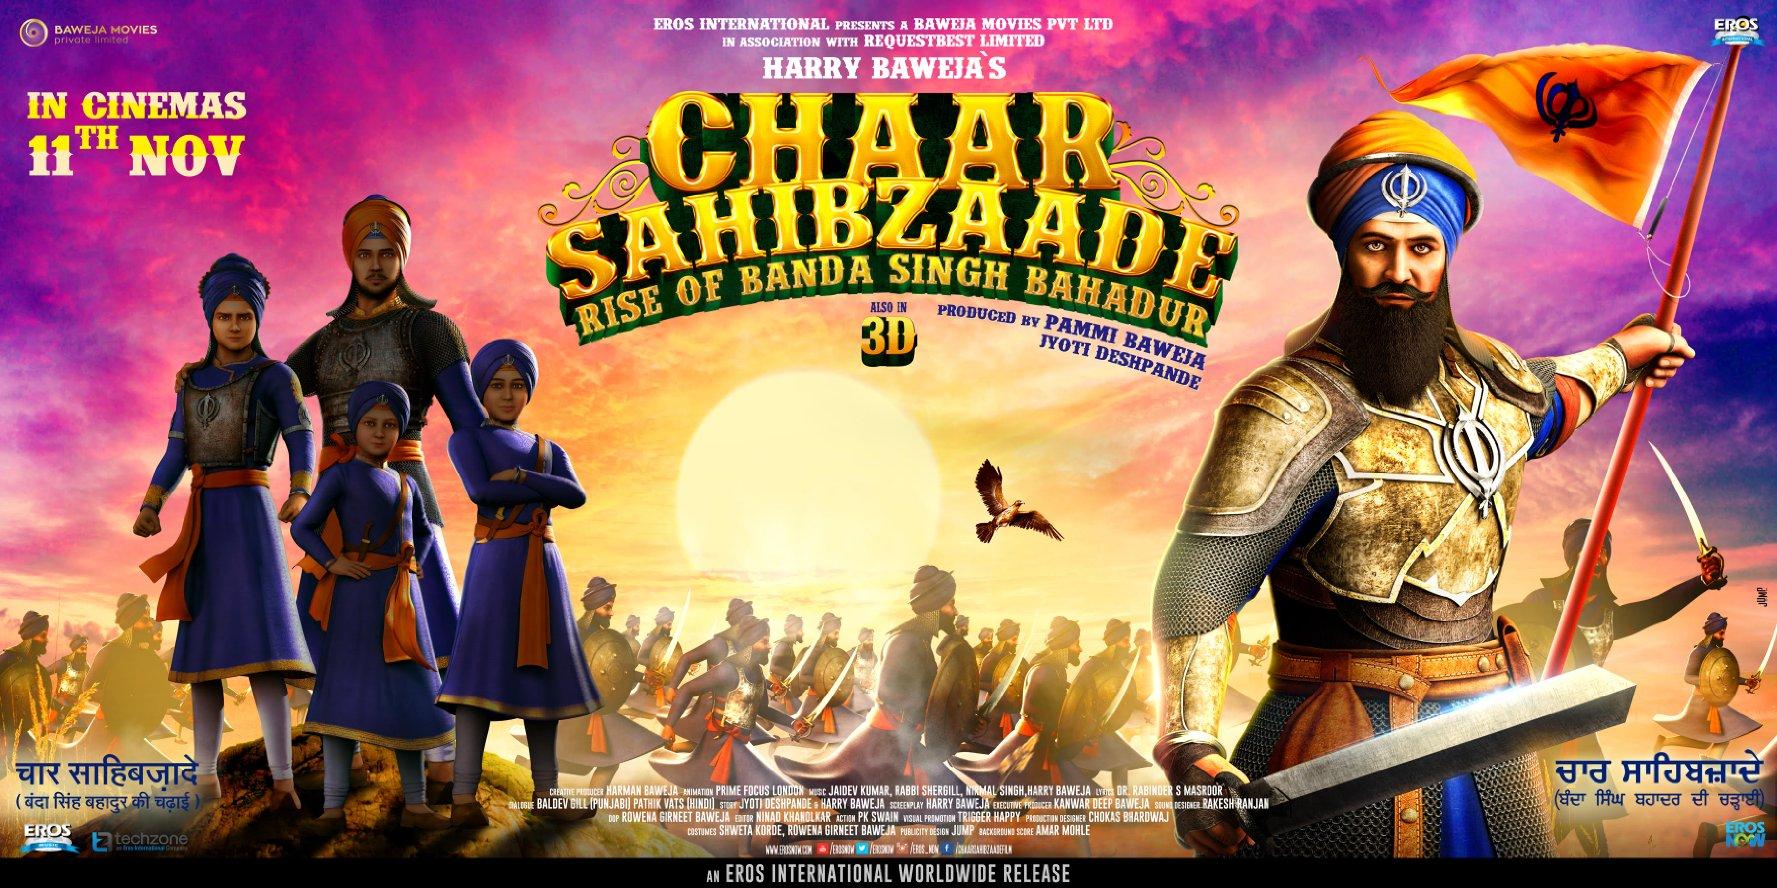 Chaar Sahibzaade 2: Rise of Banda Singh Bahadur (2016) Hindi 720p HDRip x264 655 MB